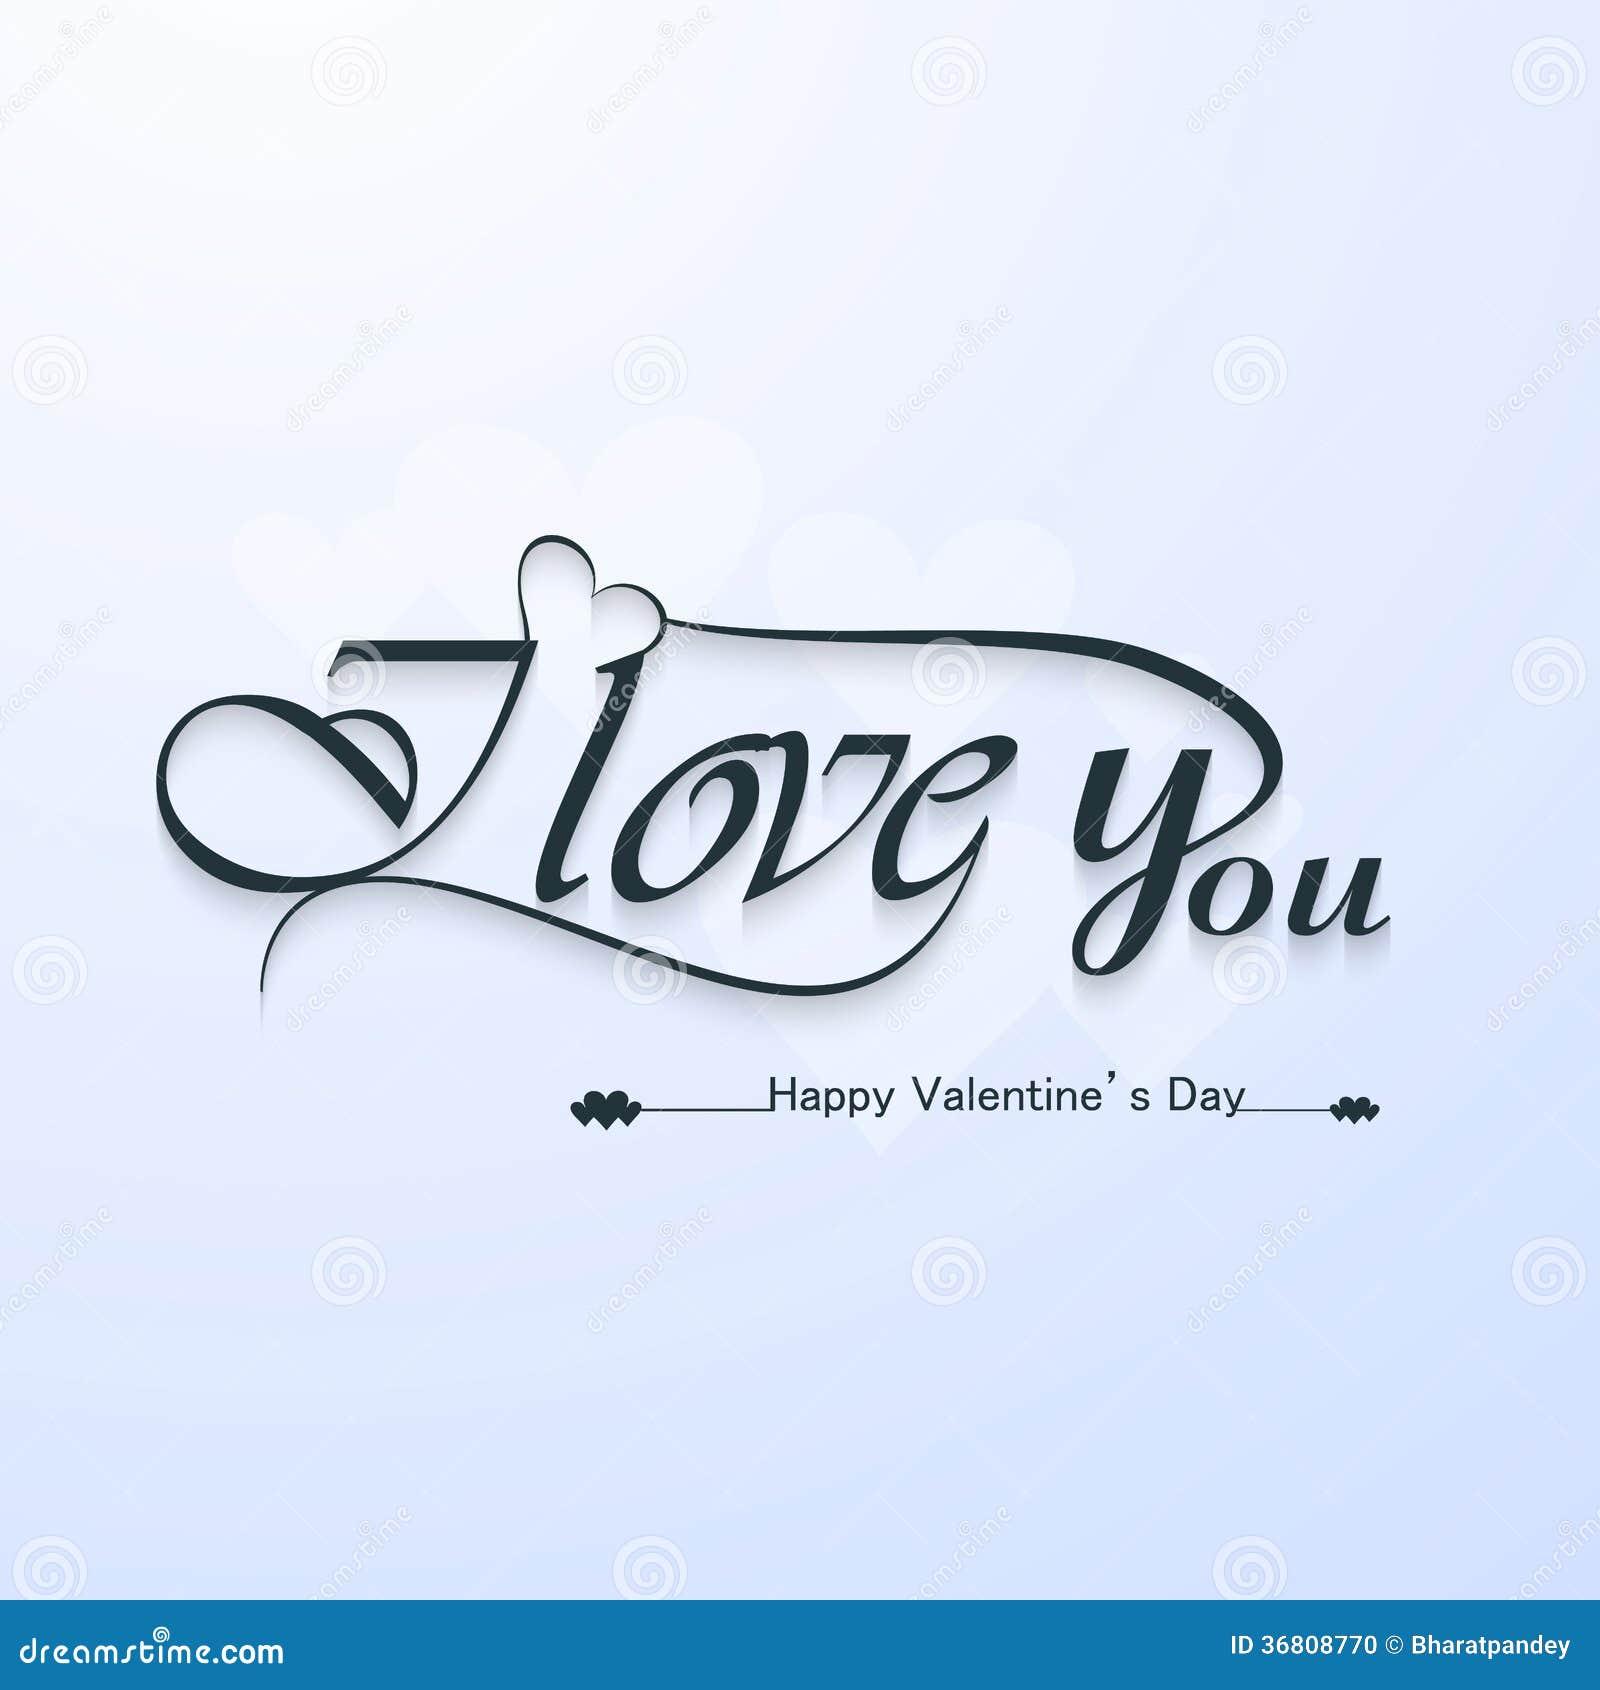 I Love You Calligraphic Headline Text Valentines Stock: i love you calligraphy